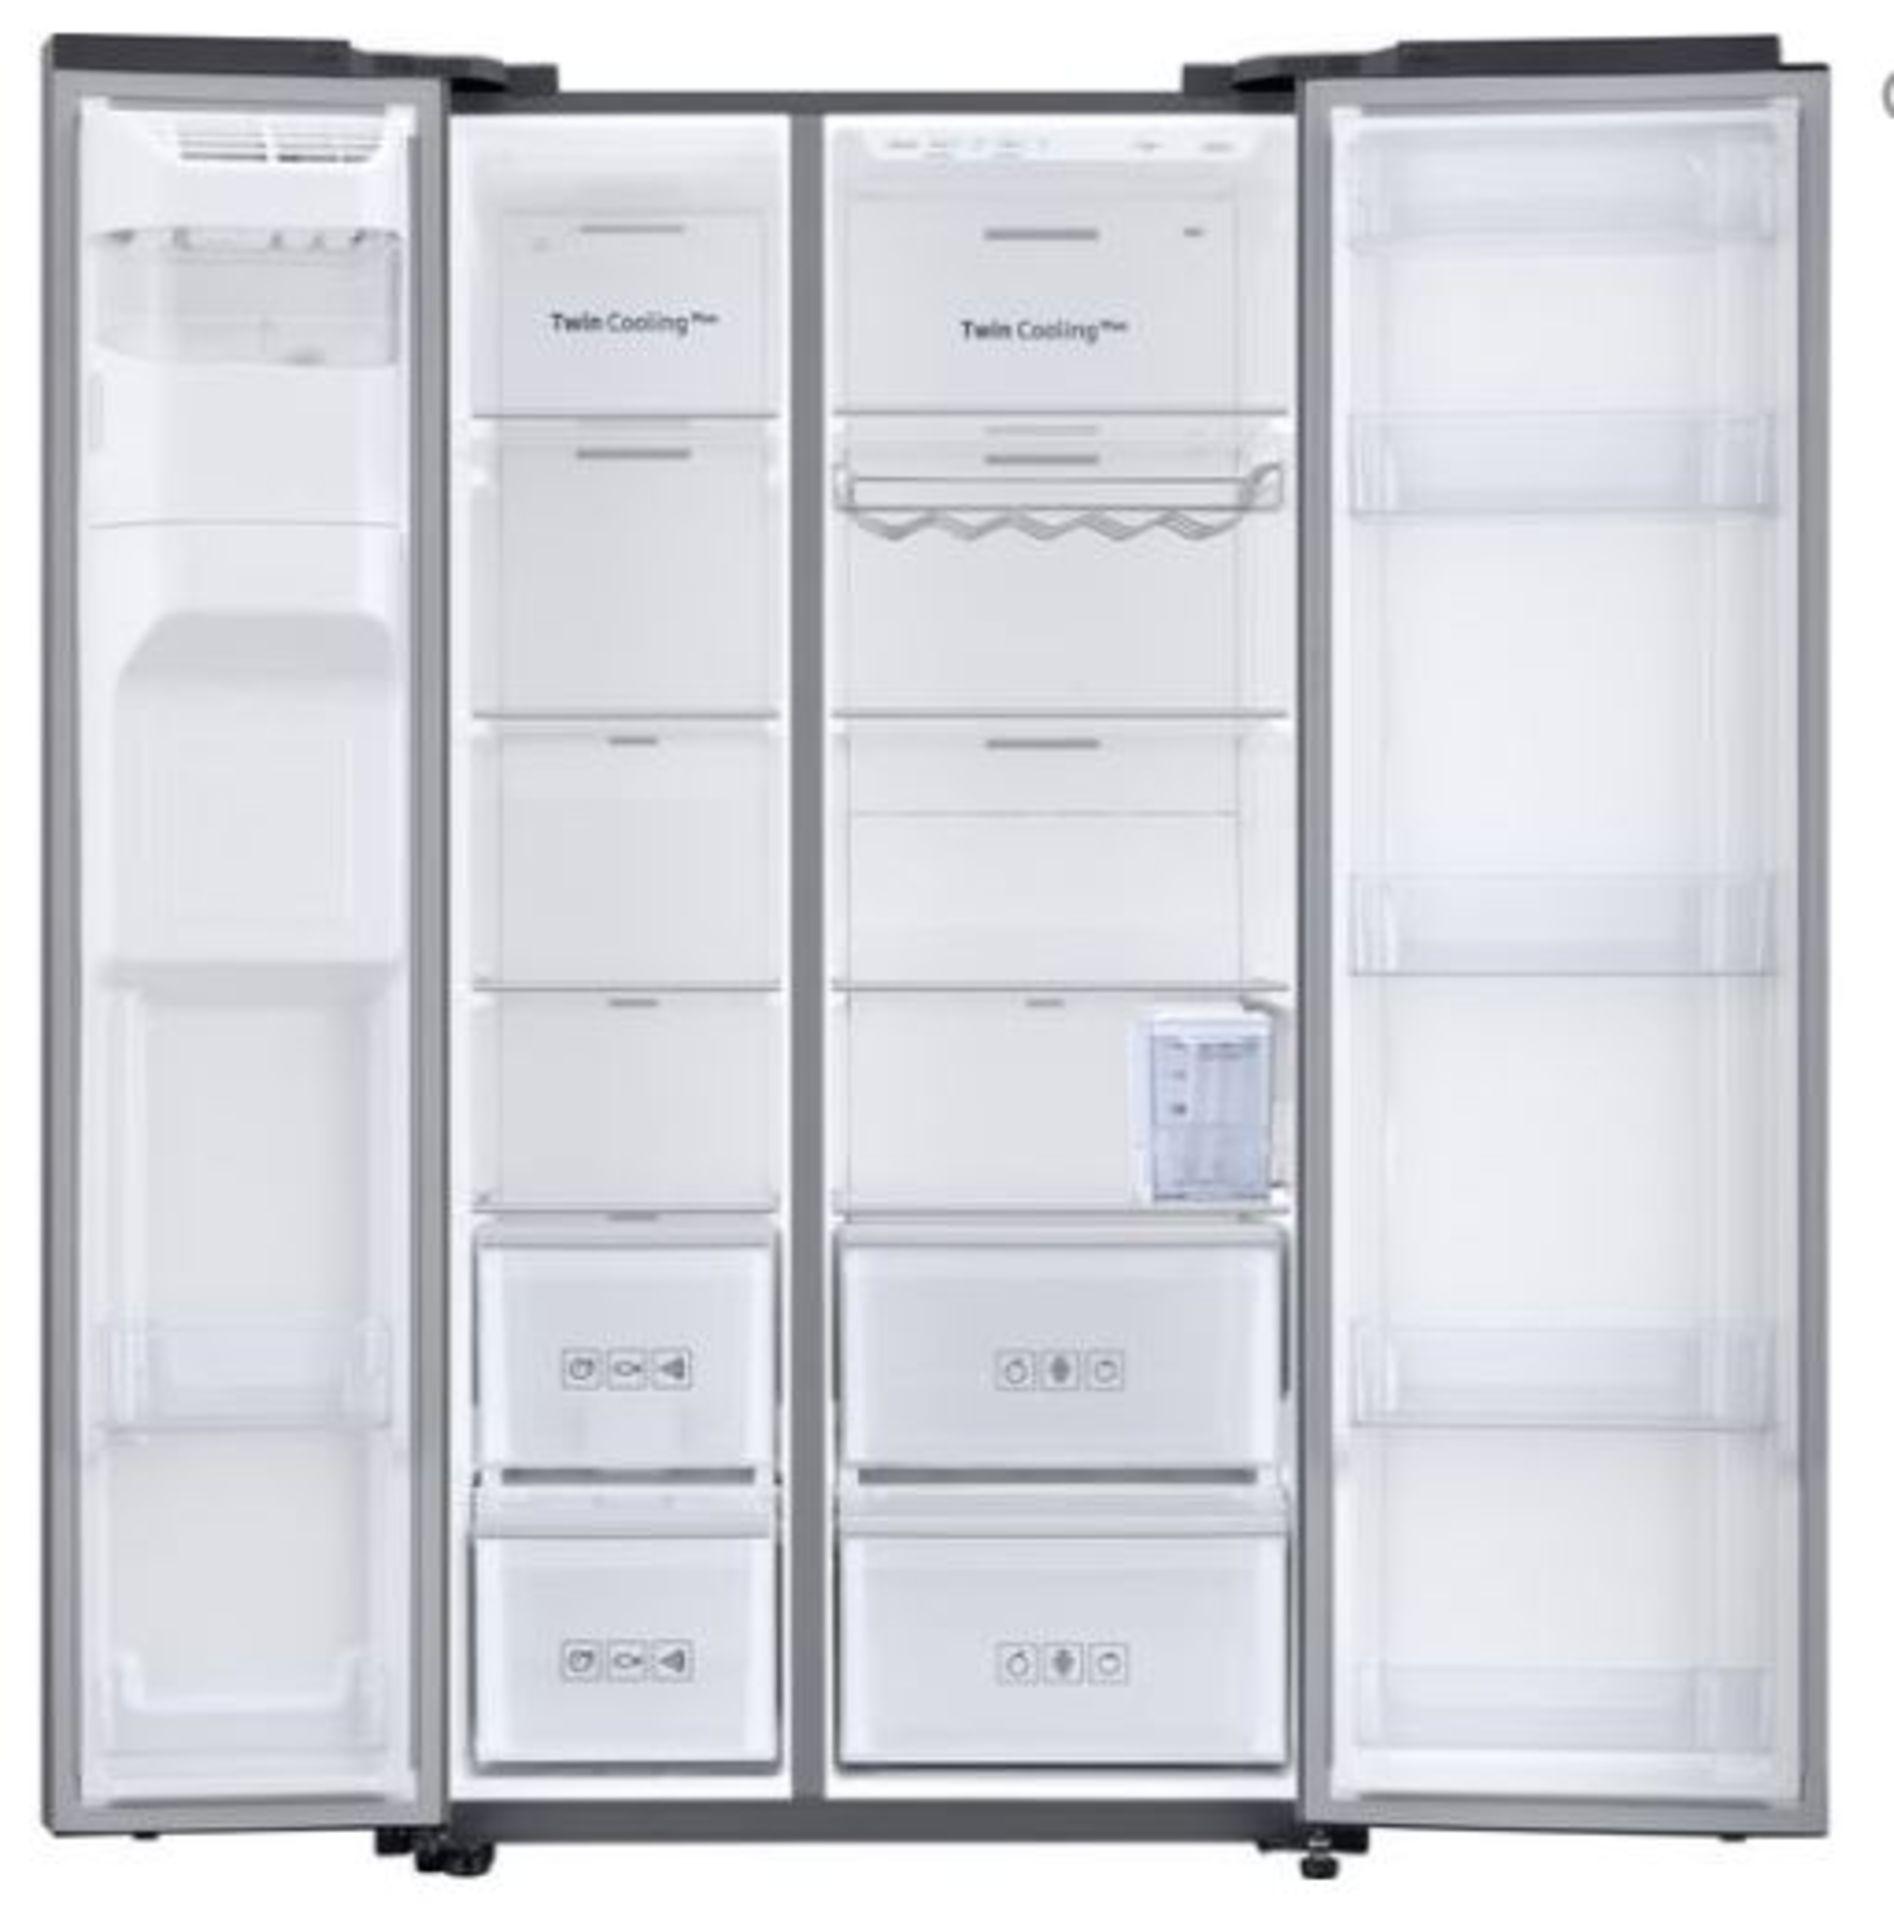 Pallet of 1 Samsung Water & Ice Fridge freezer. Latest selling price £1,329.99* - Image 3 of 9